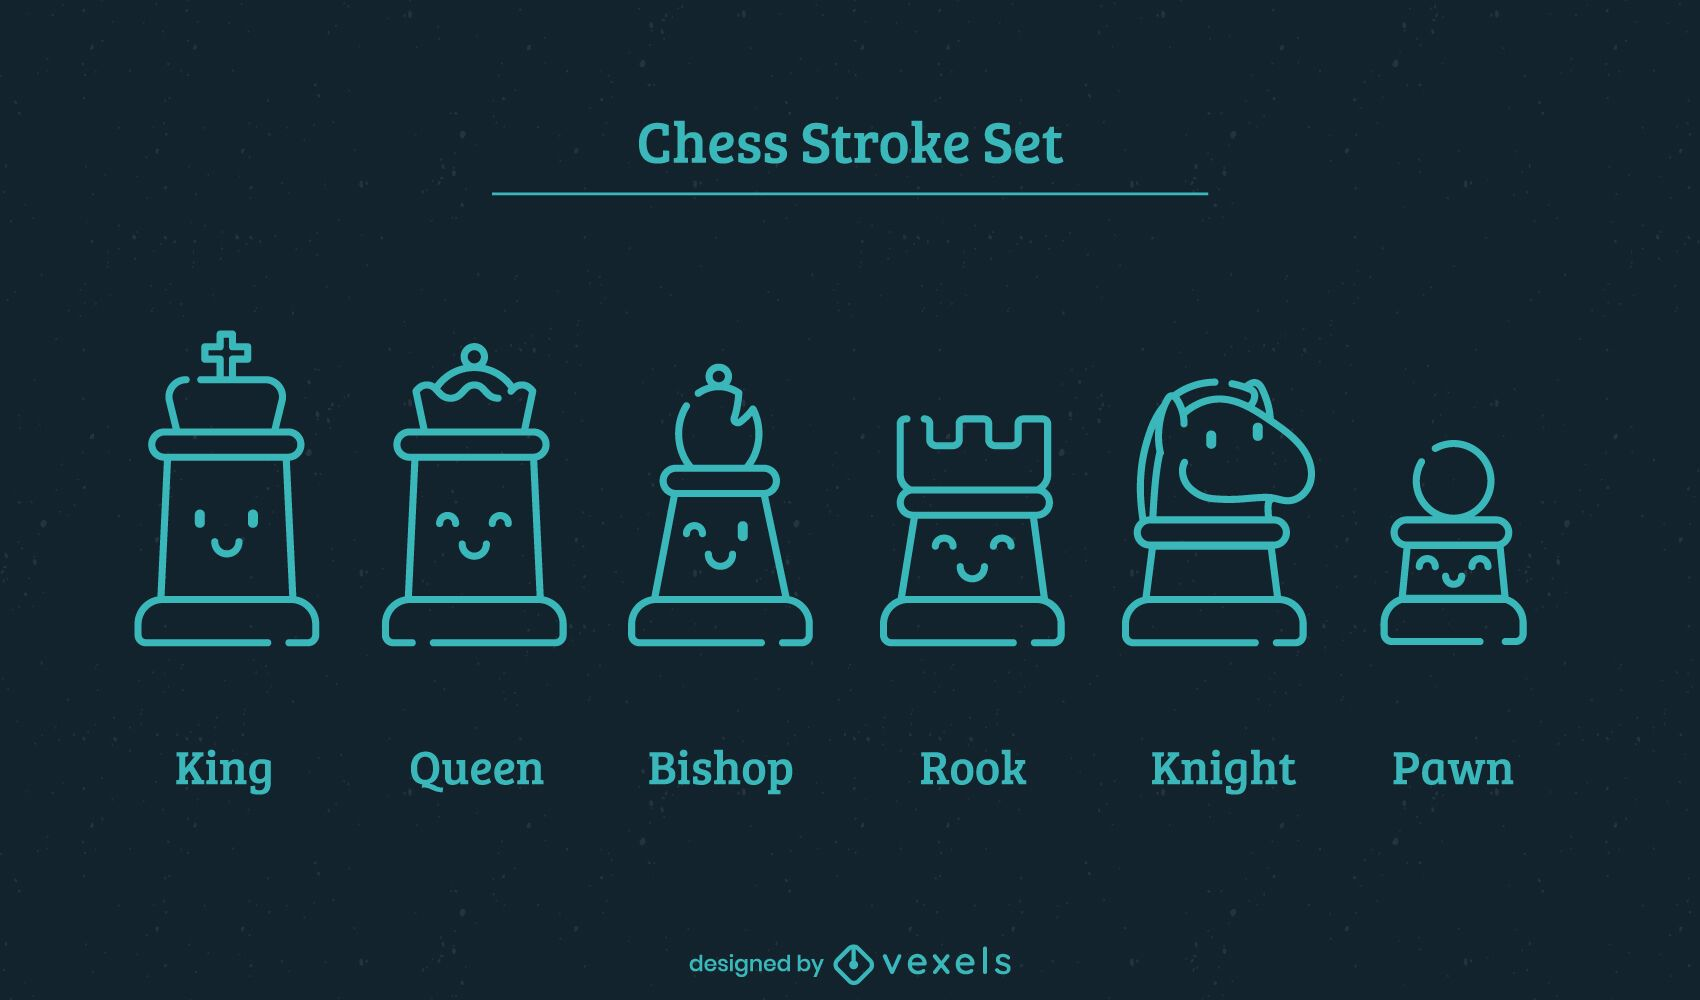 Kawaii chess pieces stroke set